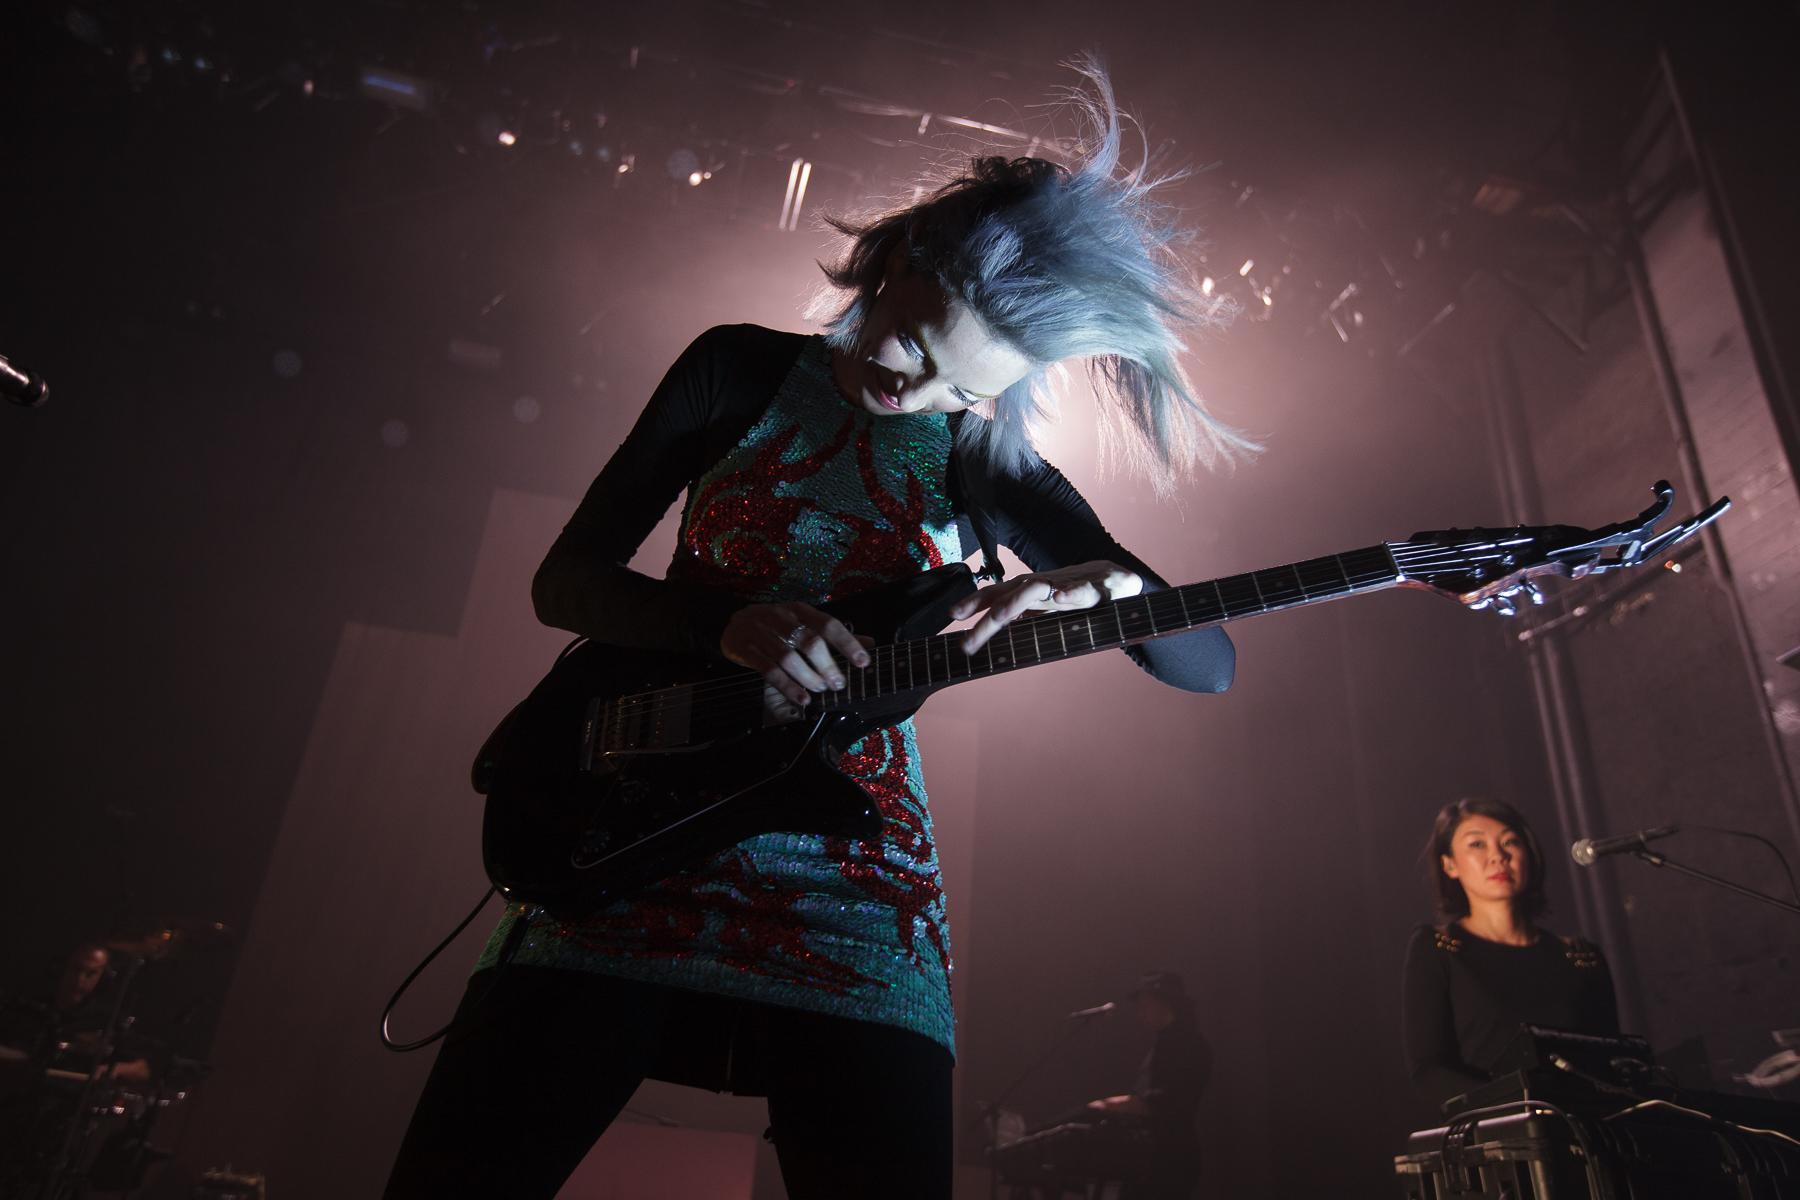 St. Vincent live at Vega, Copenhagen, 2014 (photo: Morten Aagaard Krogh)